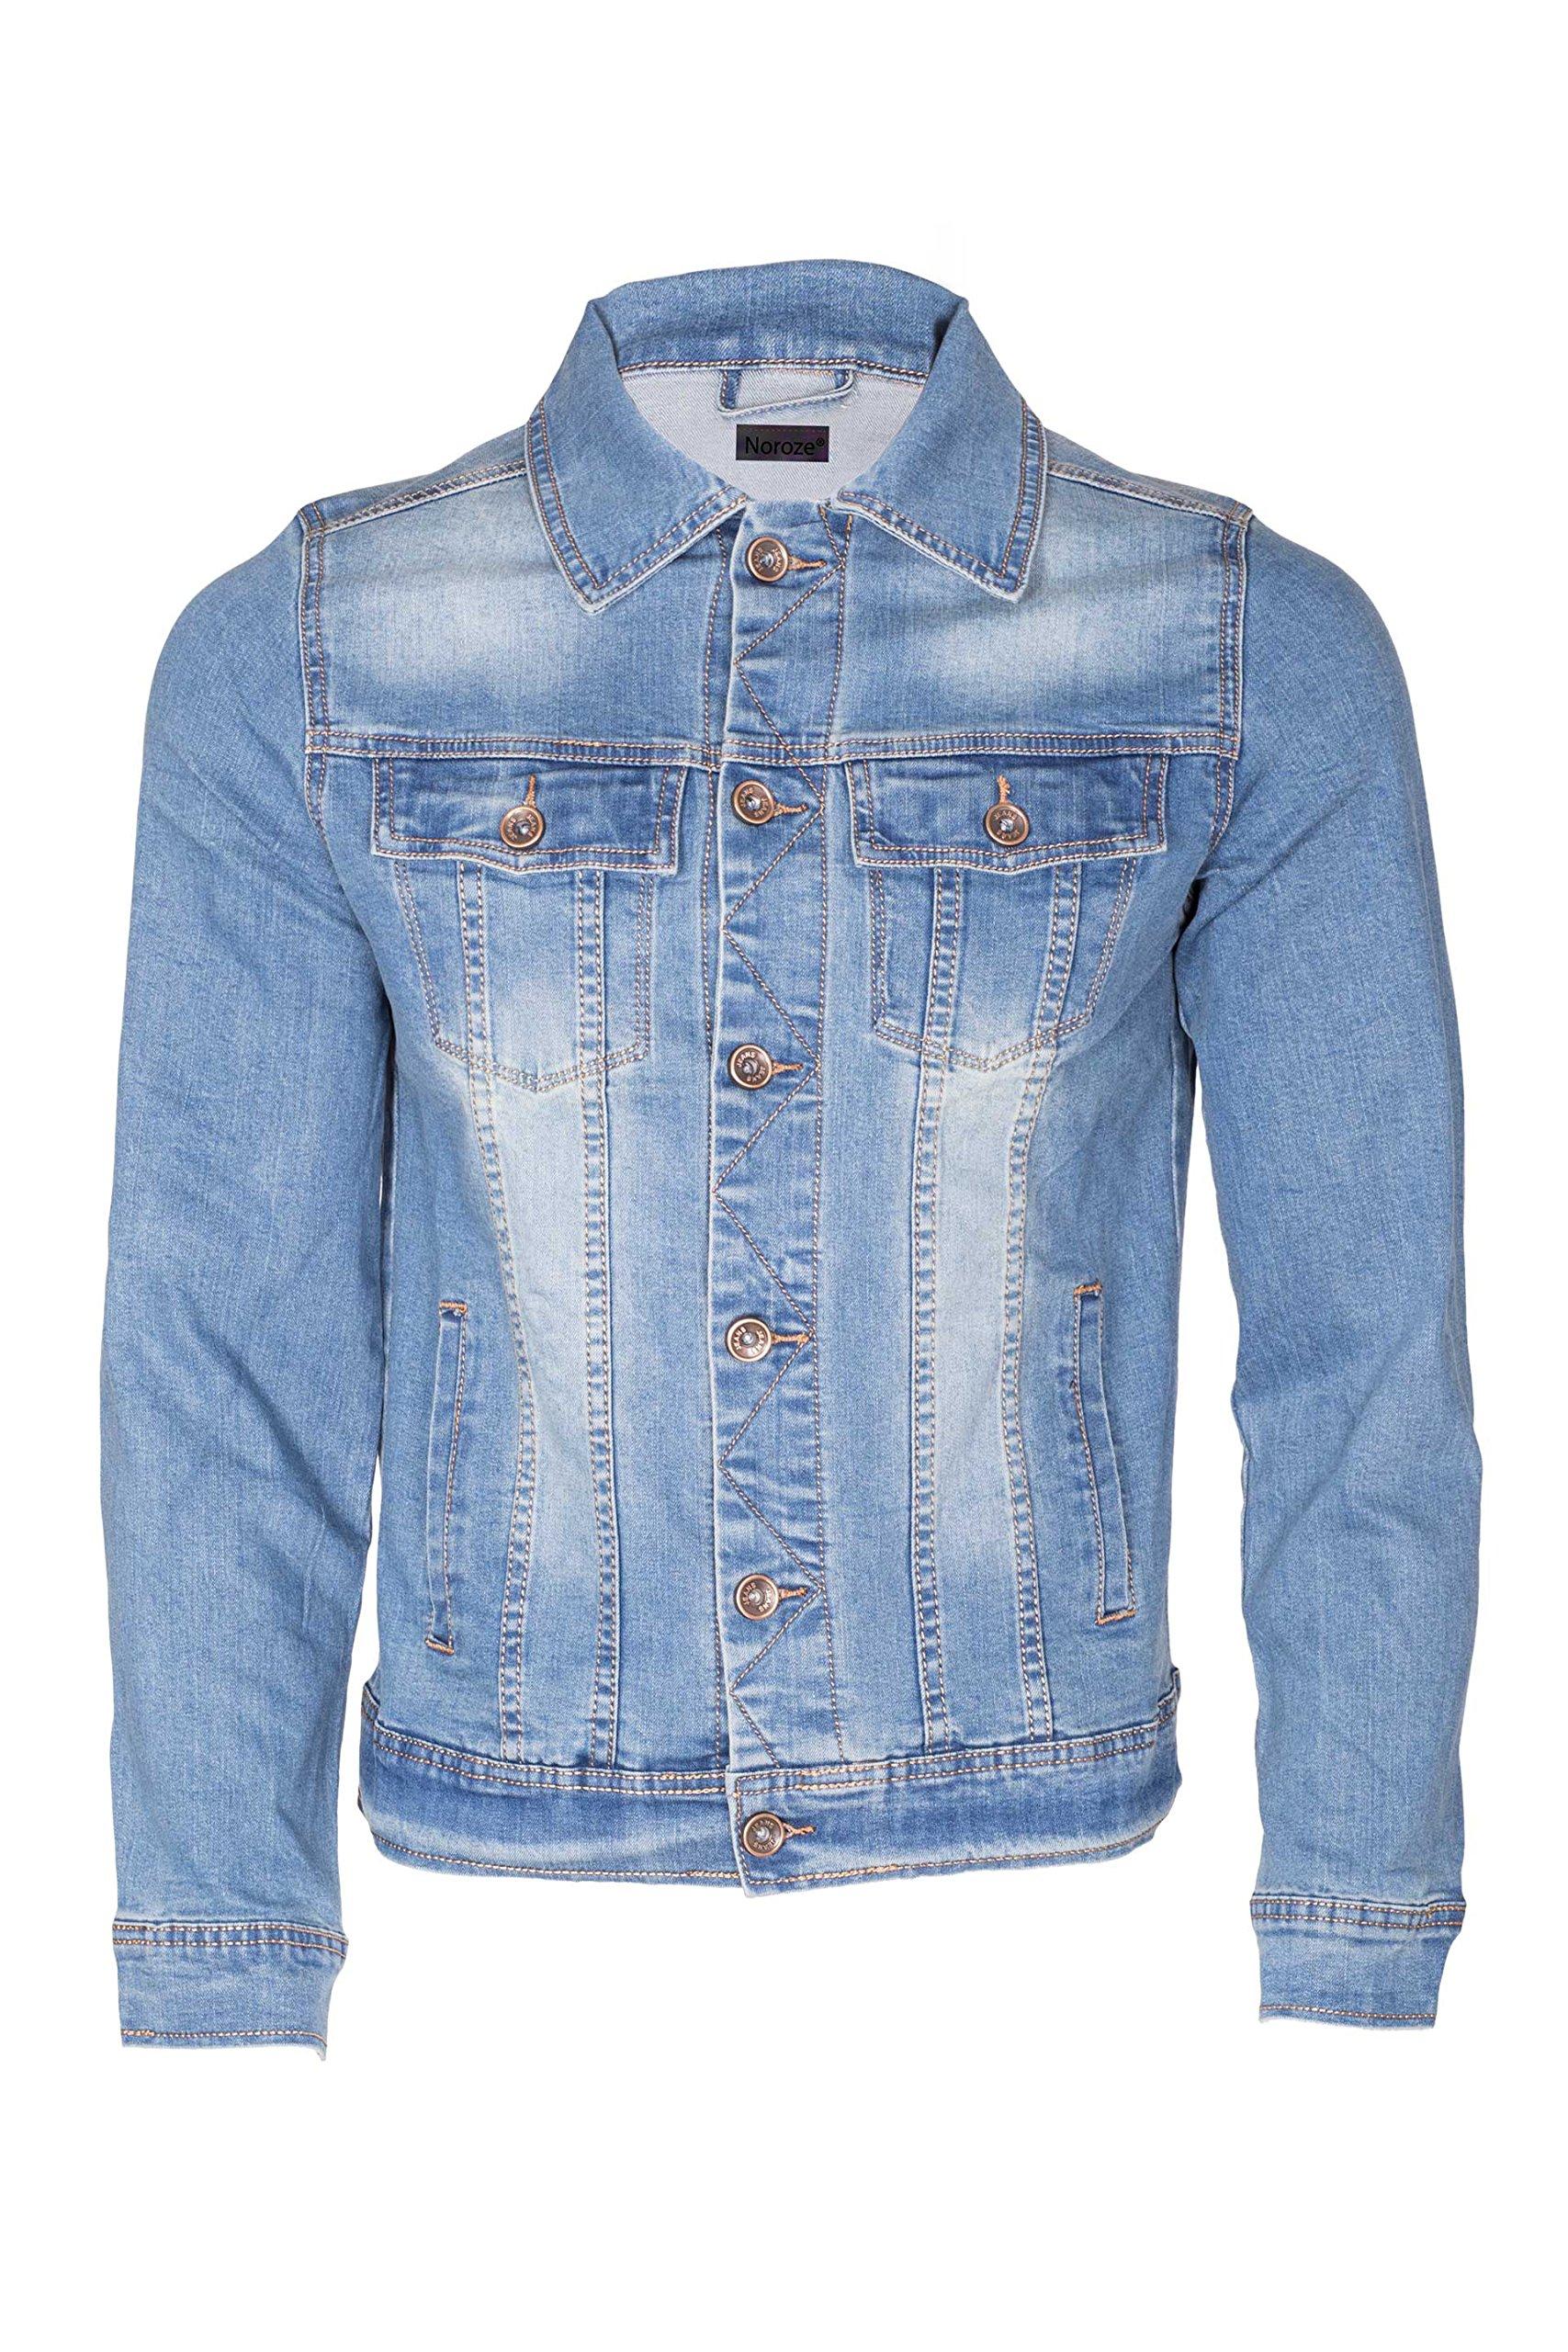 Noroze Mens Washed Denim Trucker Jacket (Blue, L) by Noroze